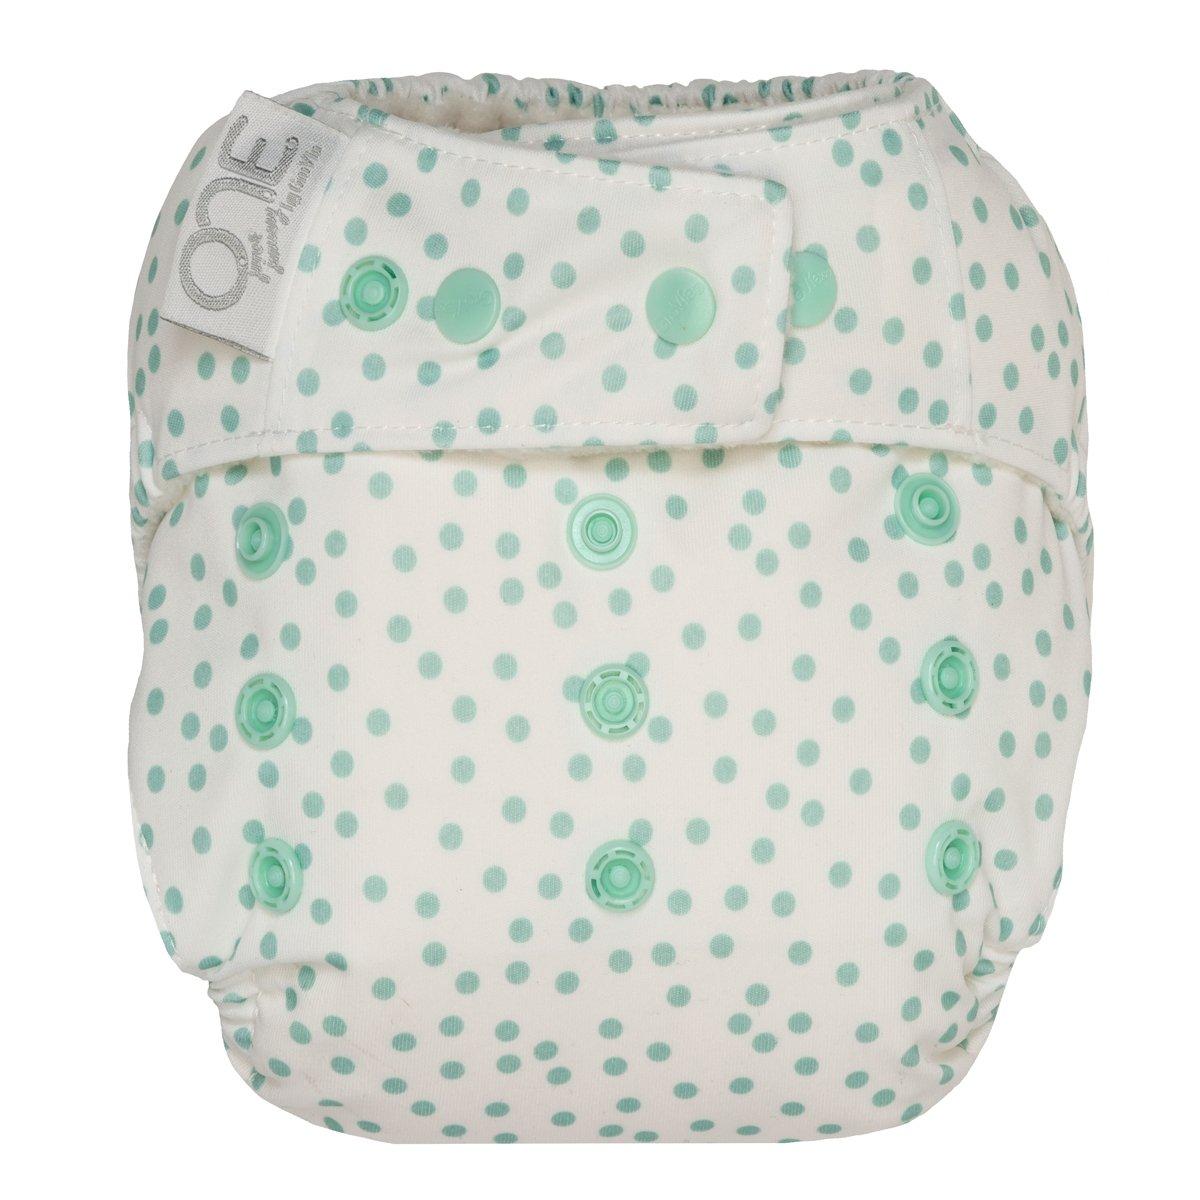 GroVia One Size Cloth Diaper Shell Set -  Soft Mint Dot